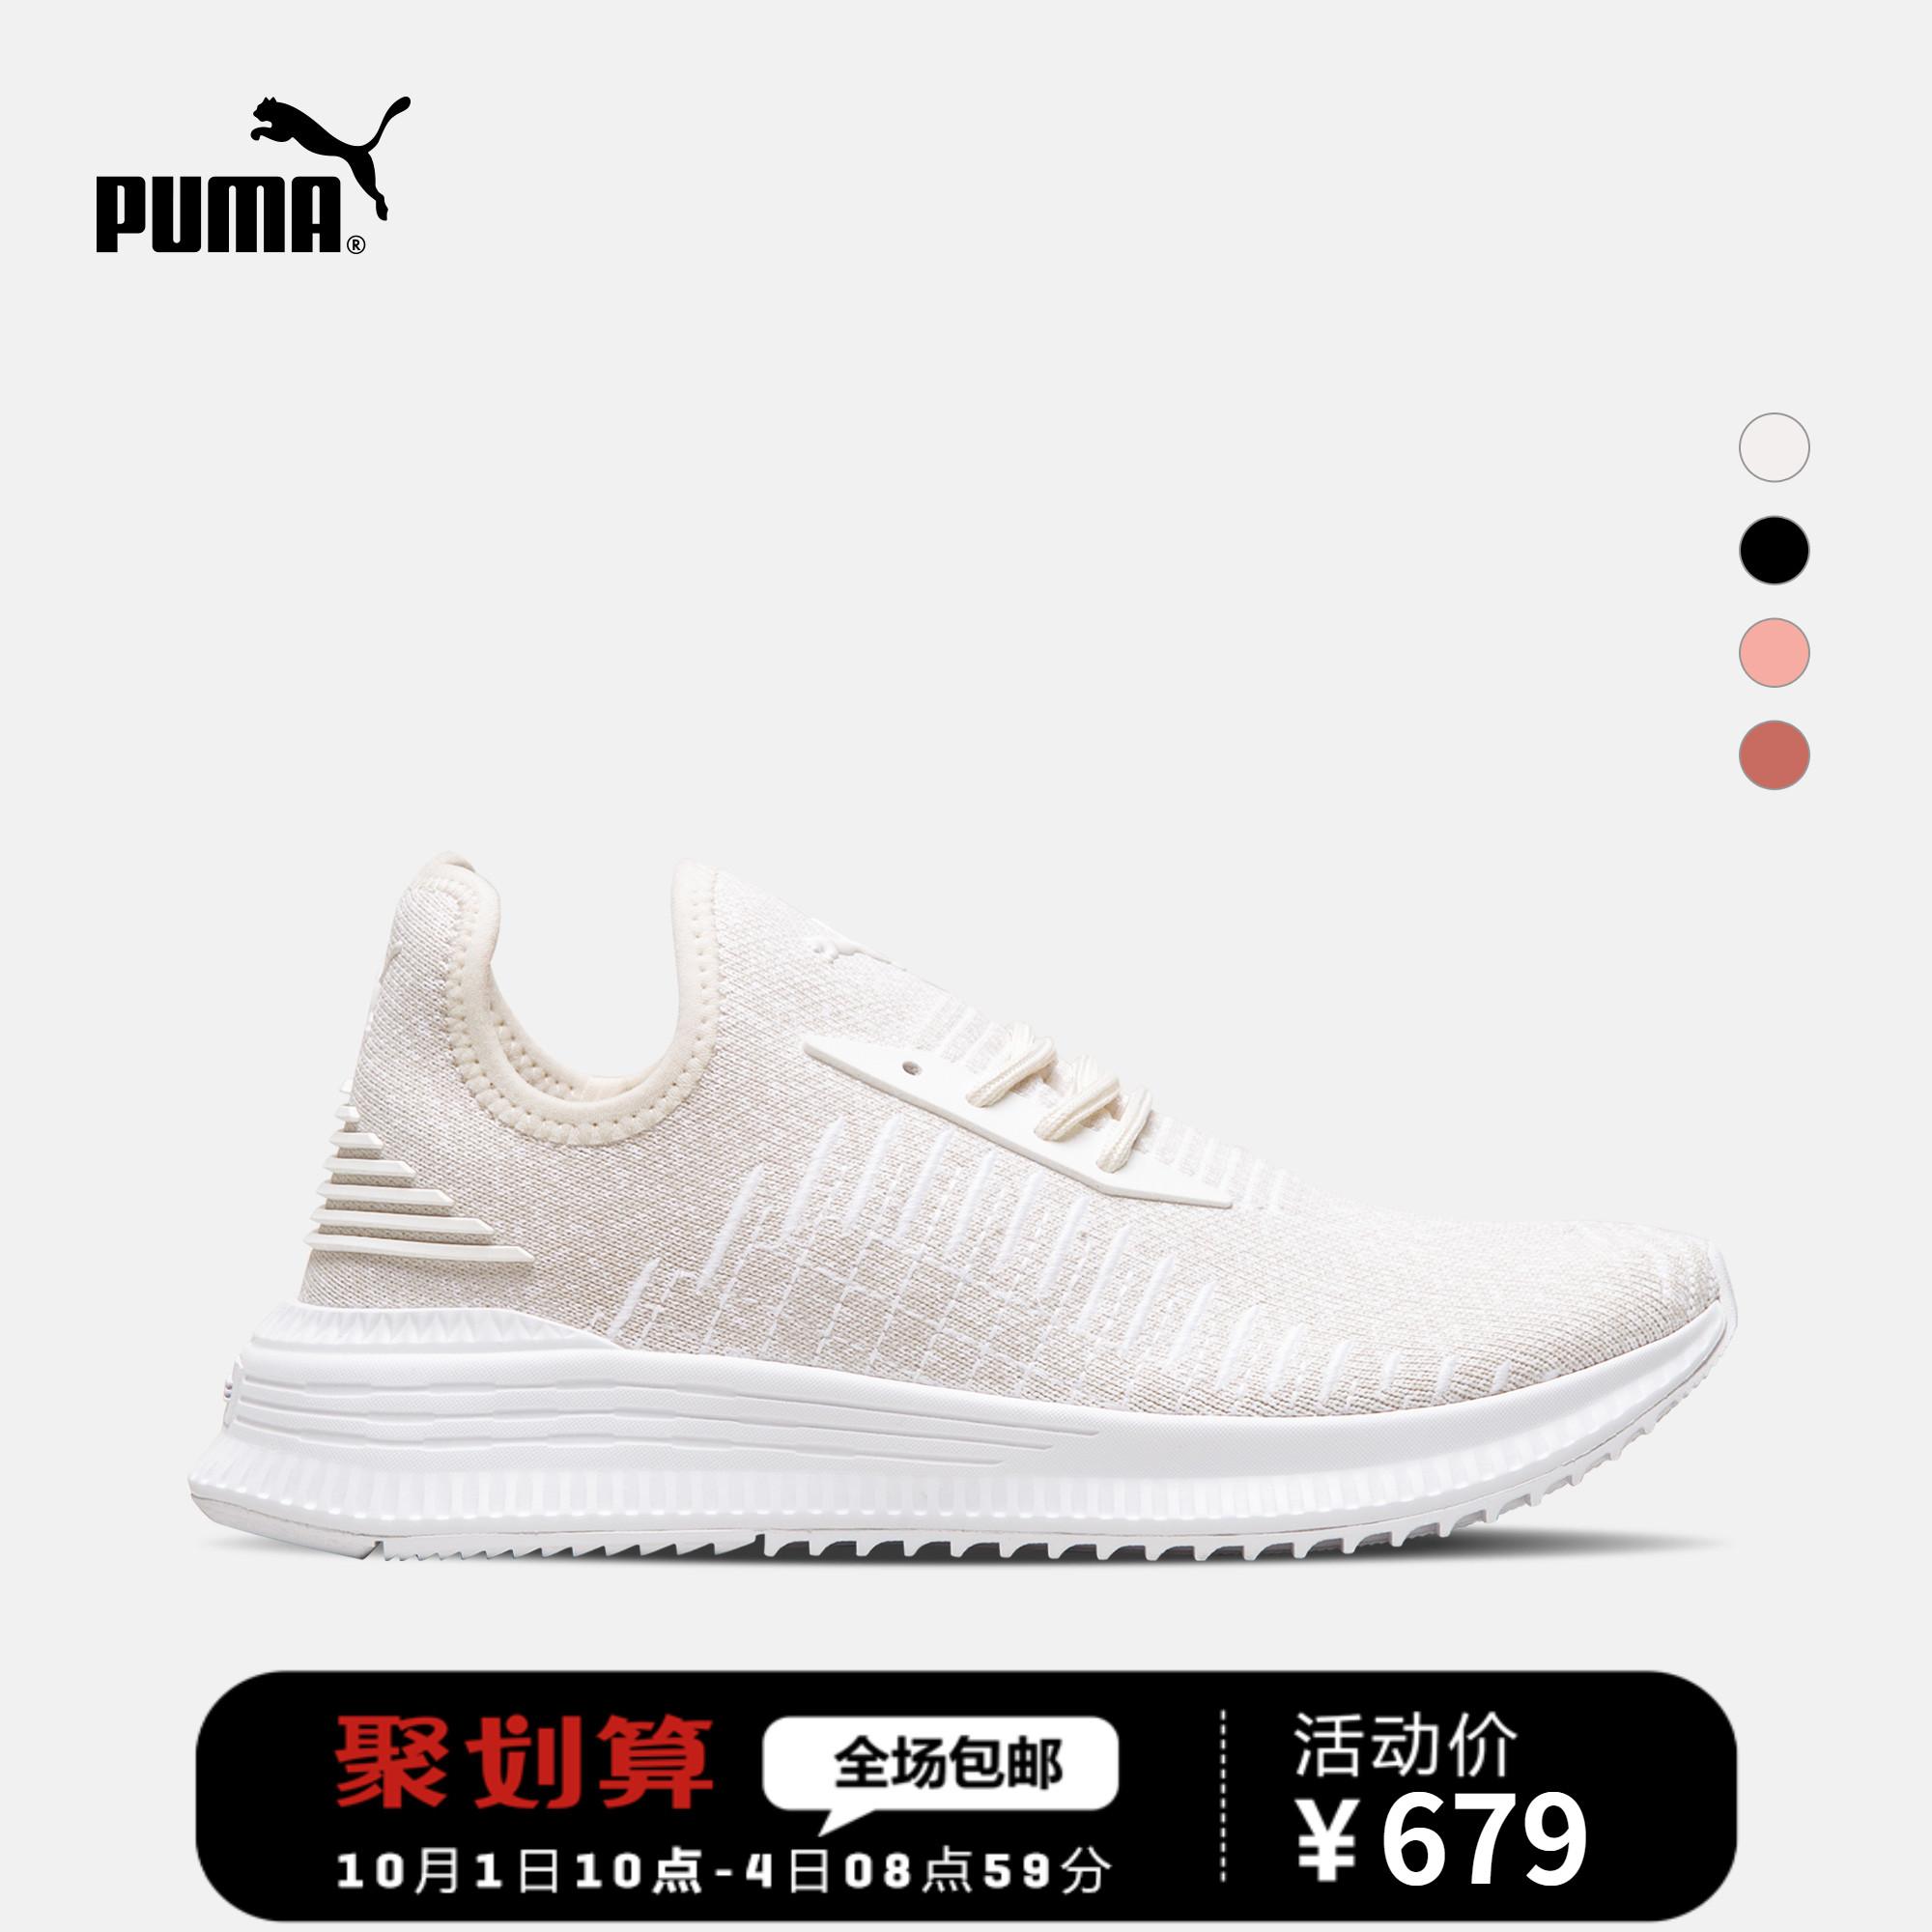 PUMA彪马官方 杨洋同款 男女同款休闲鞋 AVID evoKNIT 365392